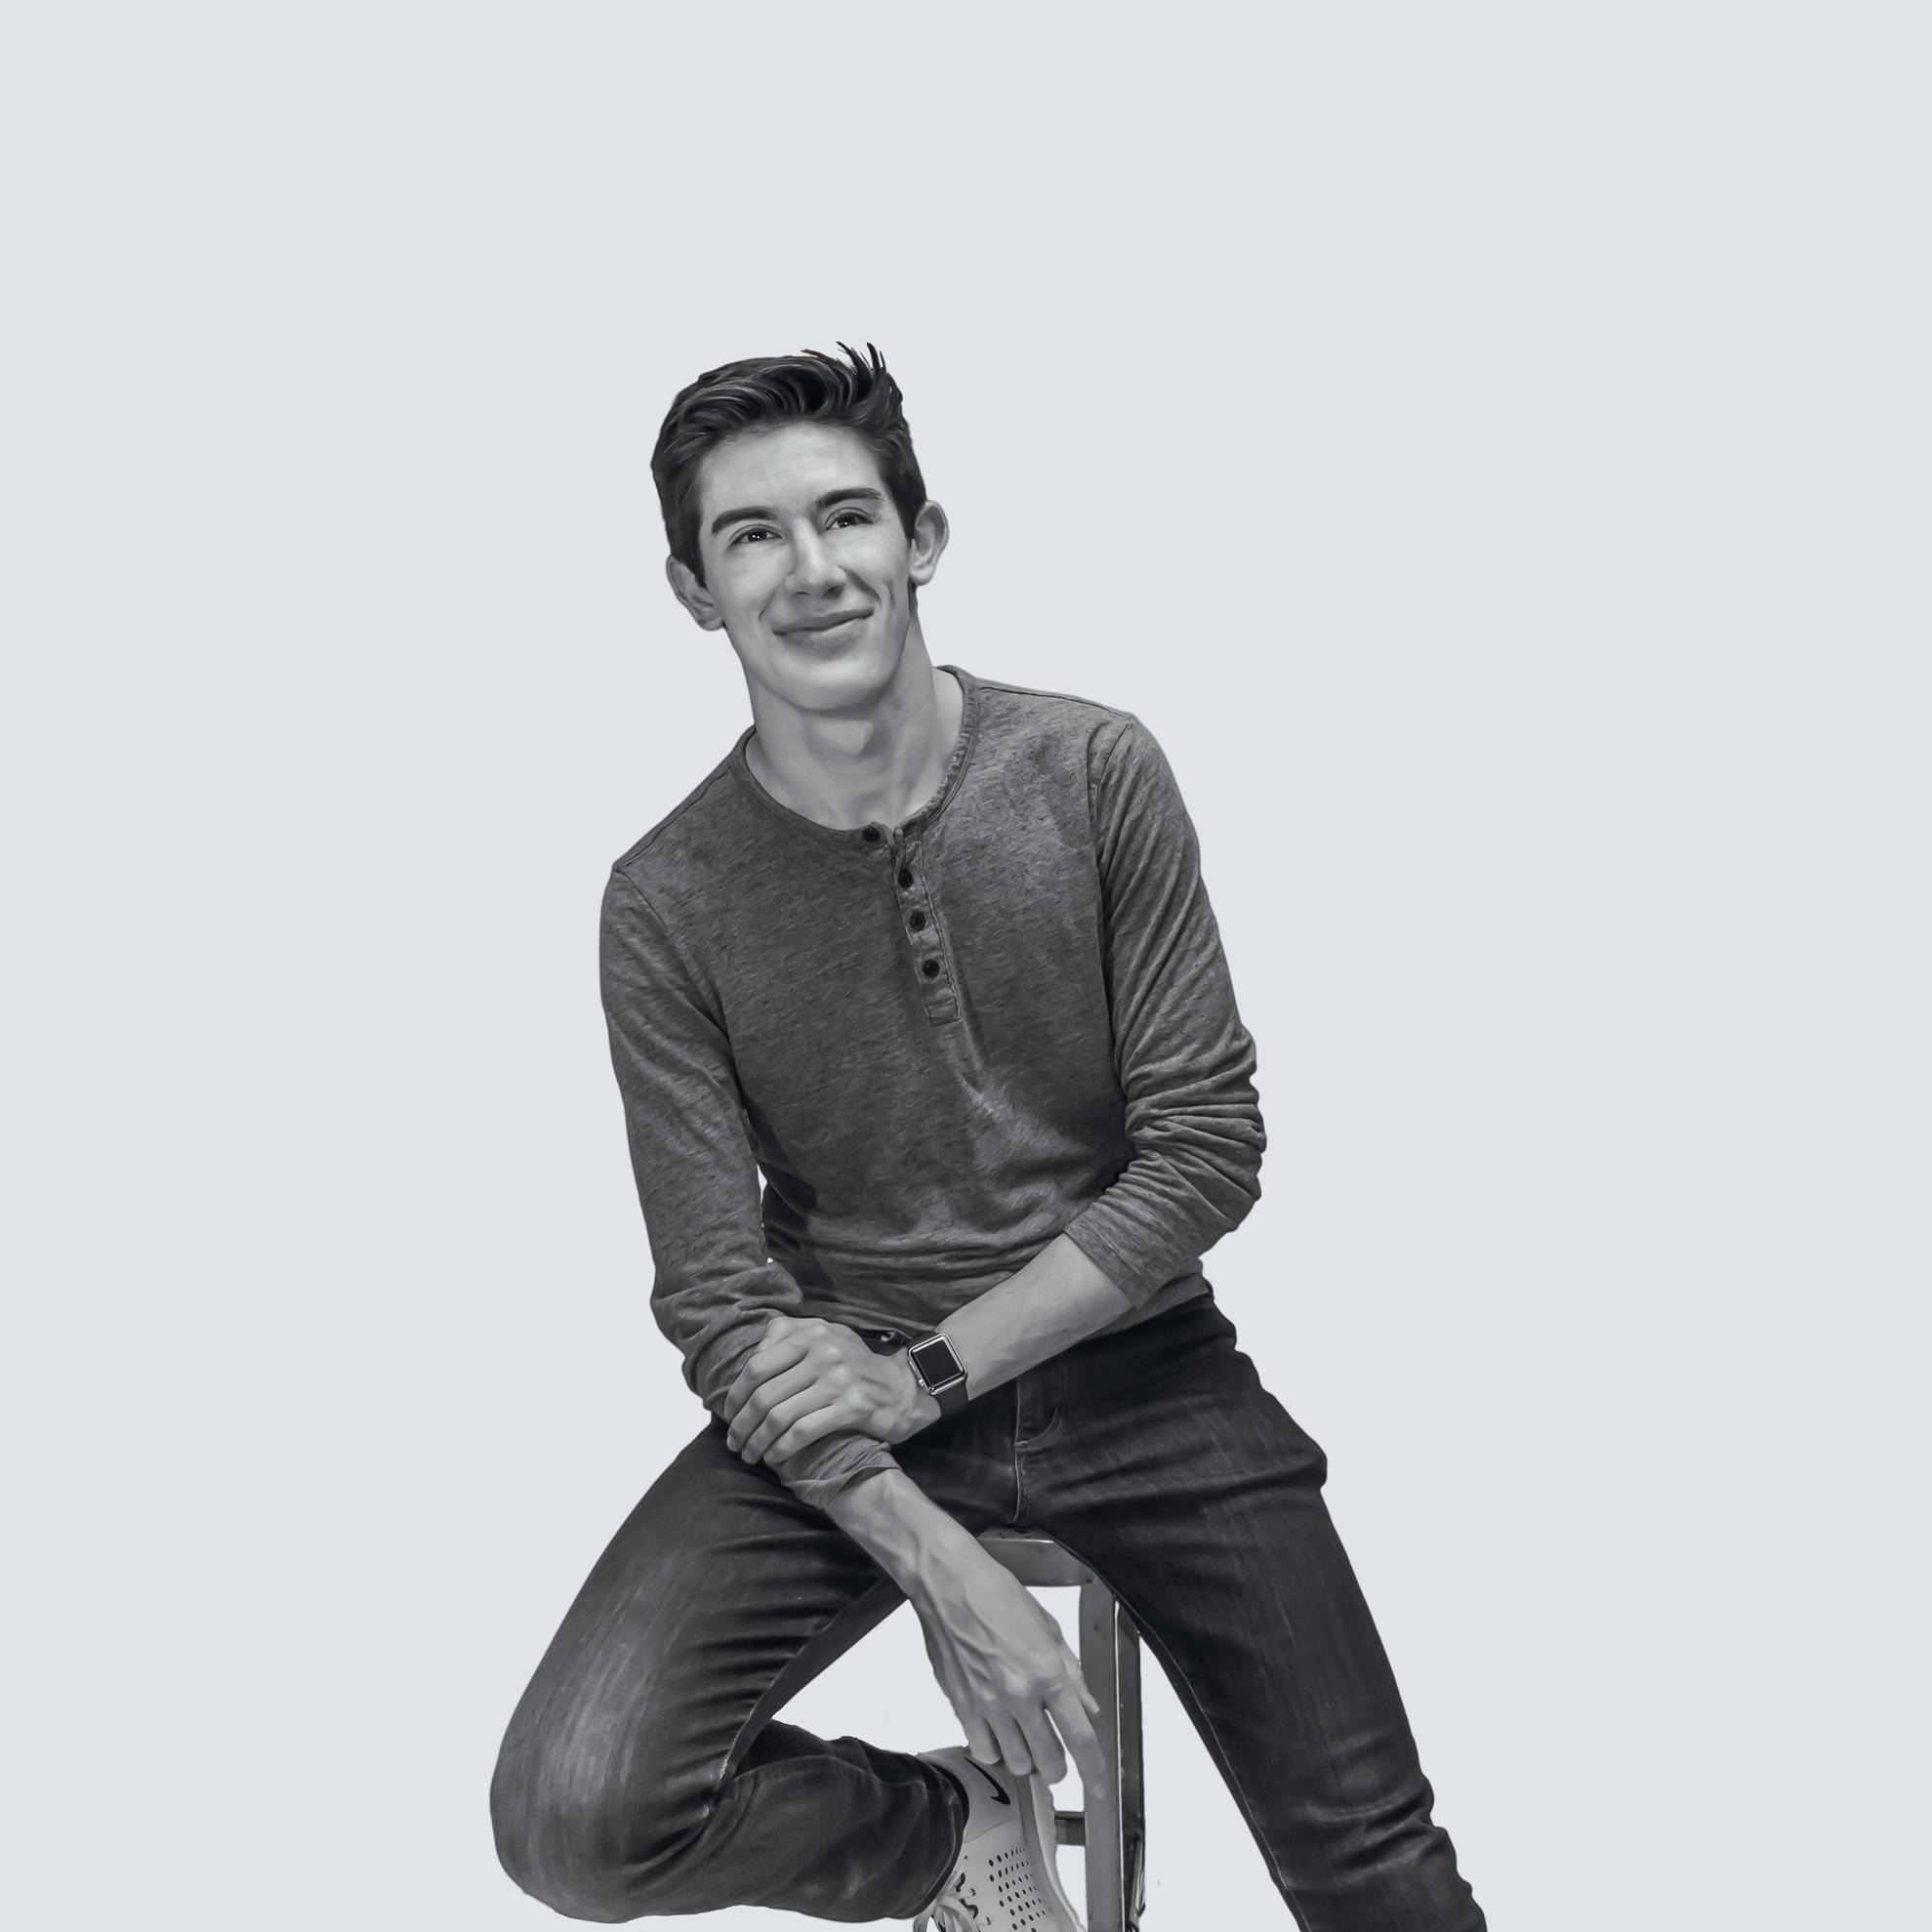 Ryan-Formal.jpg